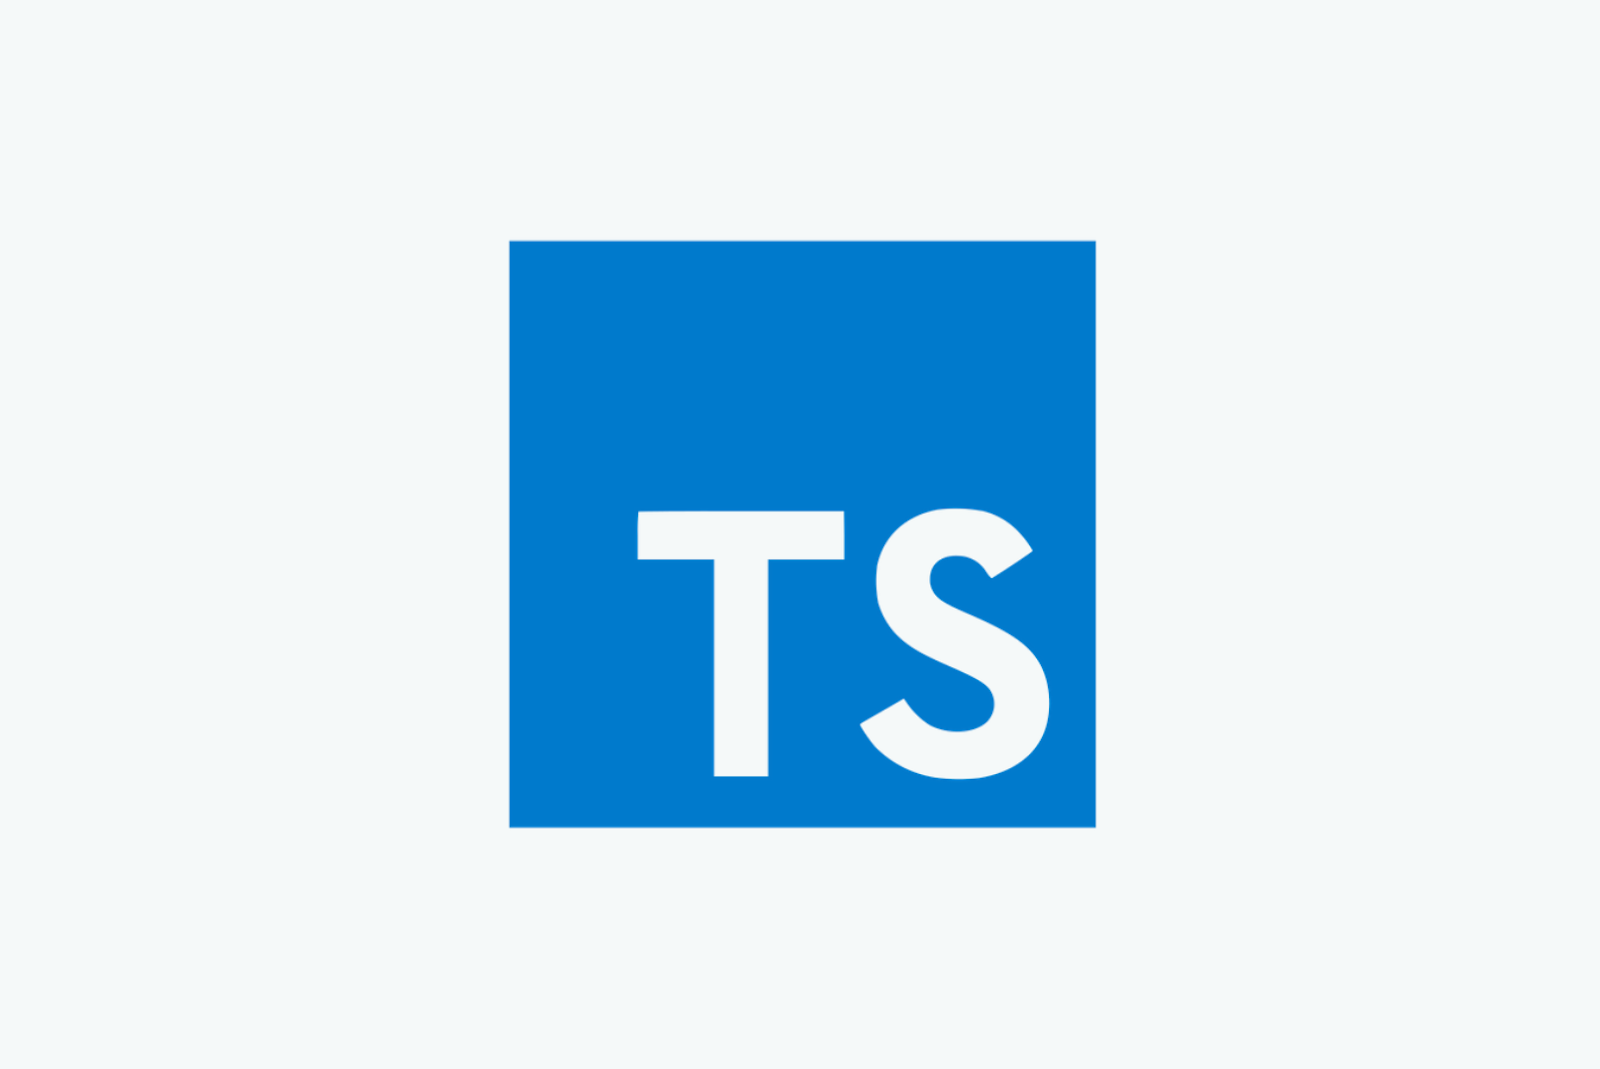 Typescript cross-platform application